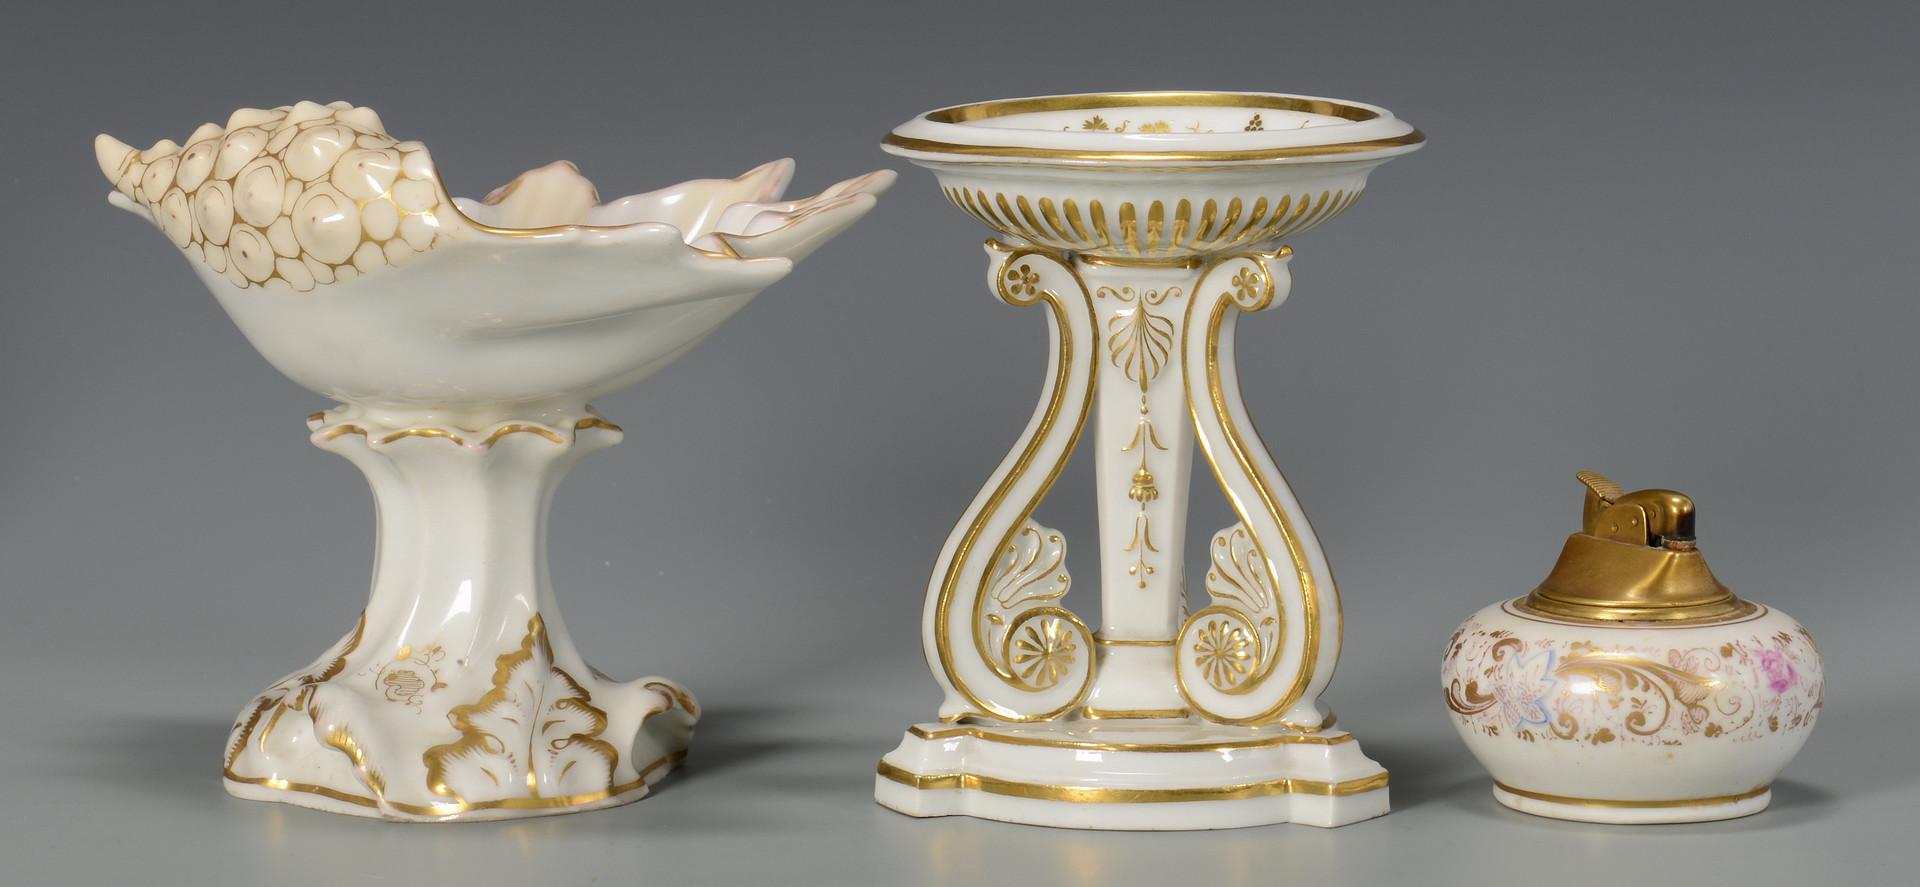 Lot 327: 5 pcs Porcelain inc. KPM